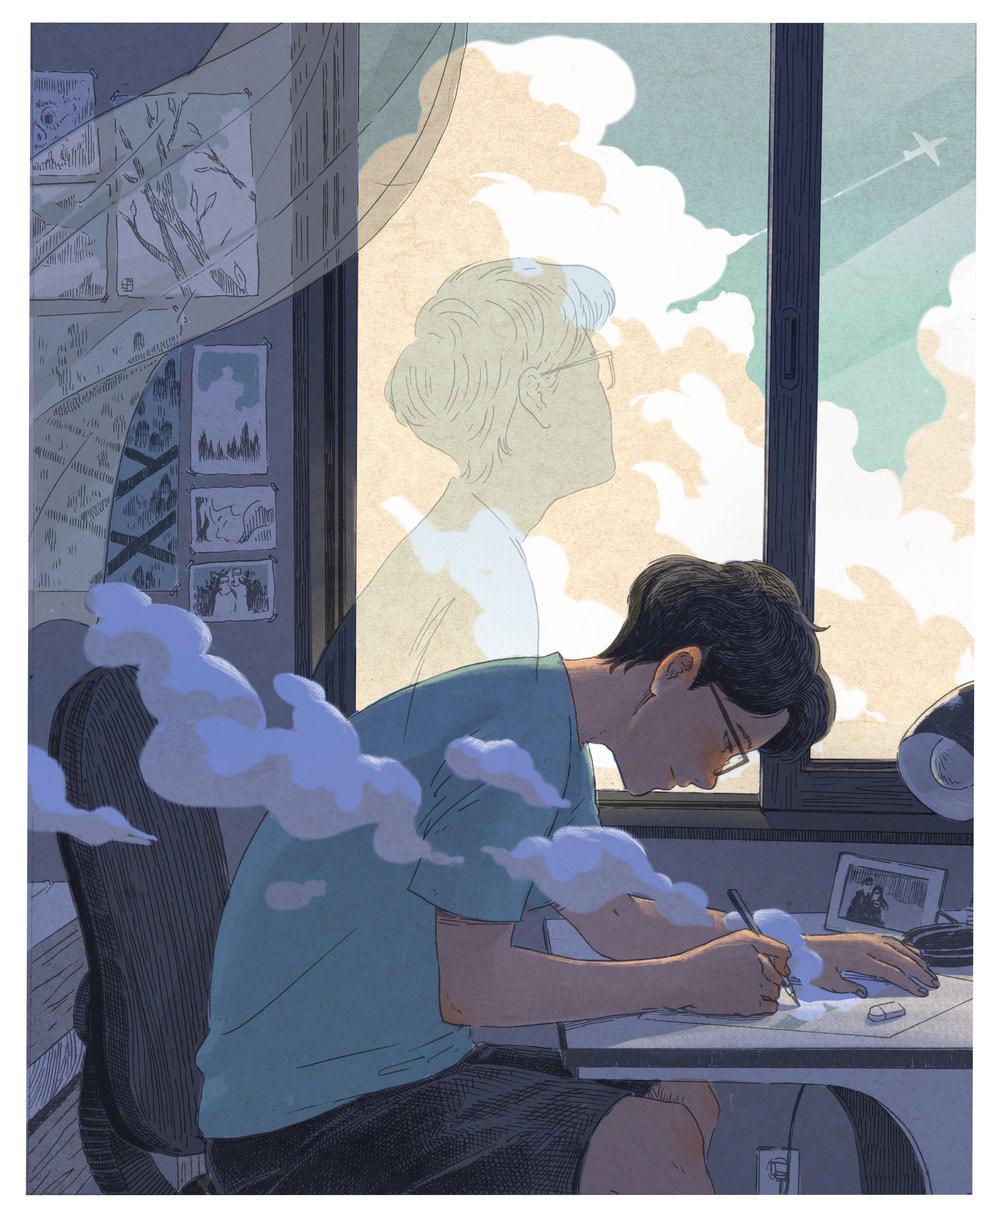 Anime Illustrations Inspiration